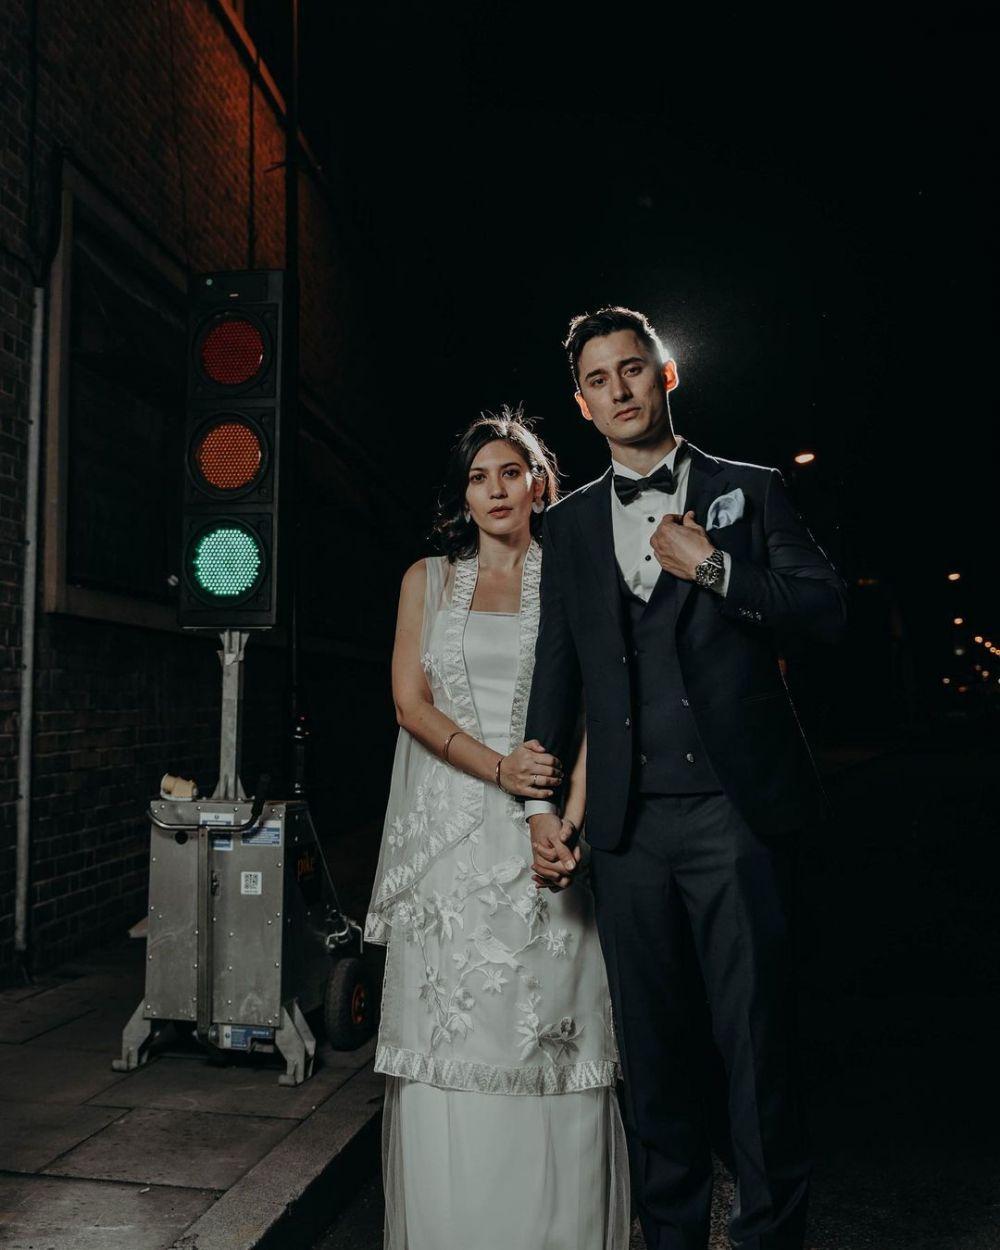 Potret pernikahan Nino Fernandez © Instagram